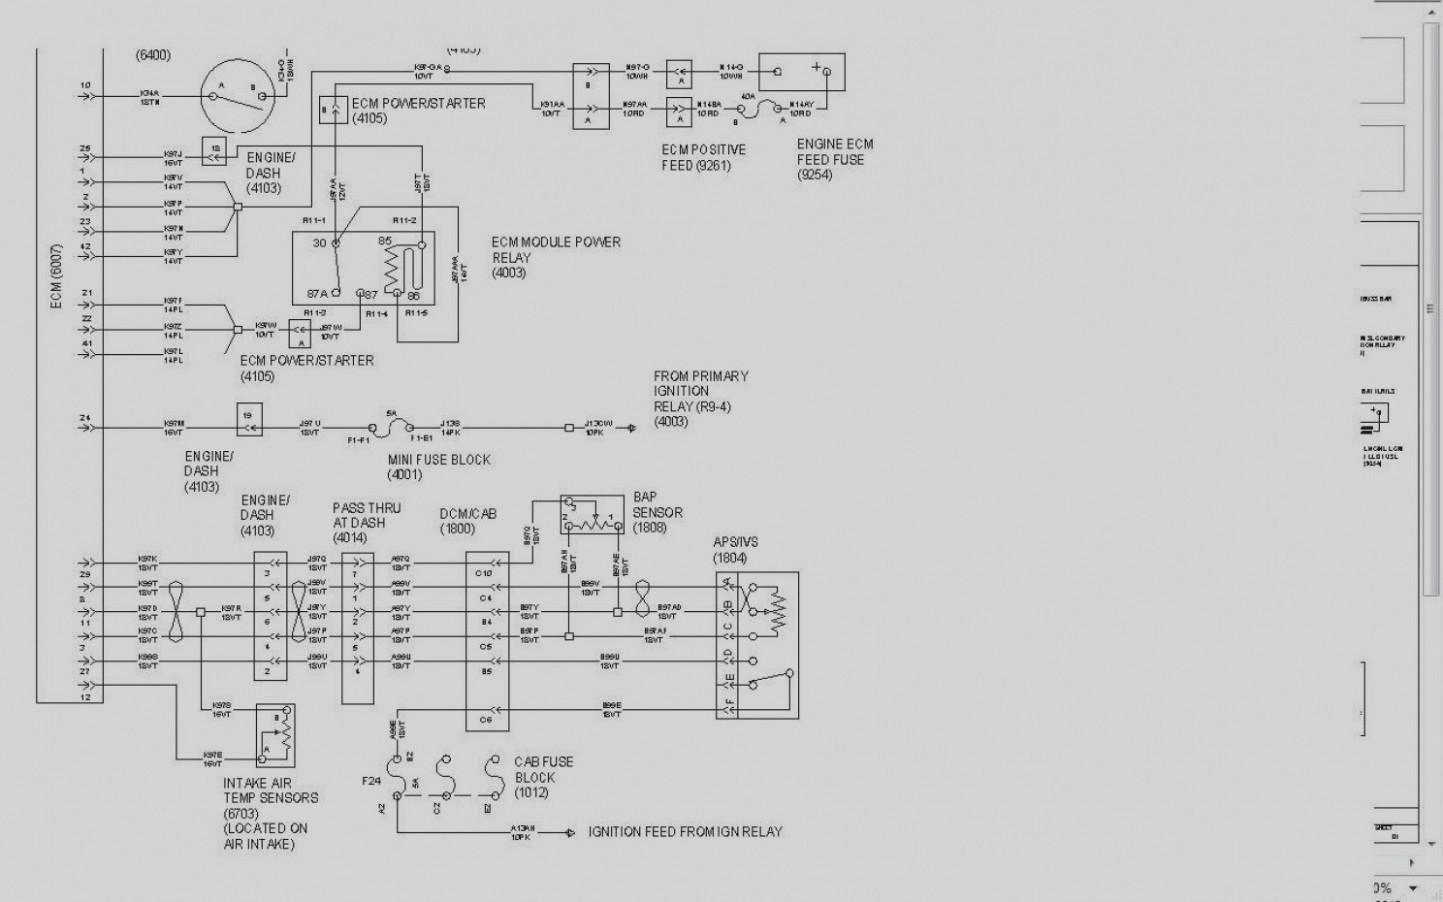 Dt7 Engine Diagram Not Working - Free Image DiagramFree Image Diagram - blogger